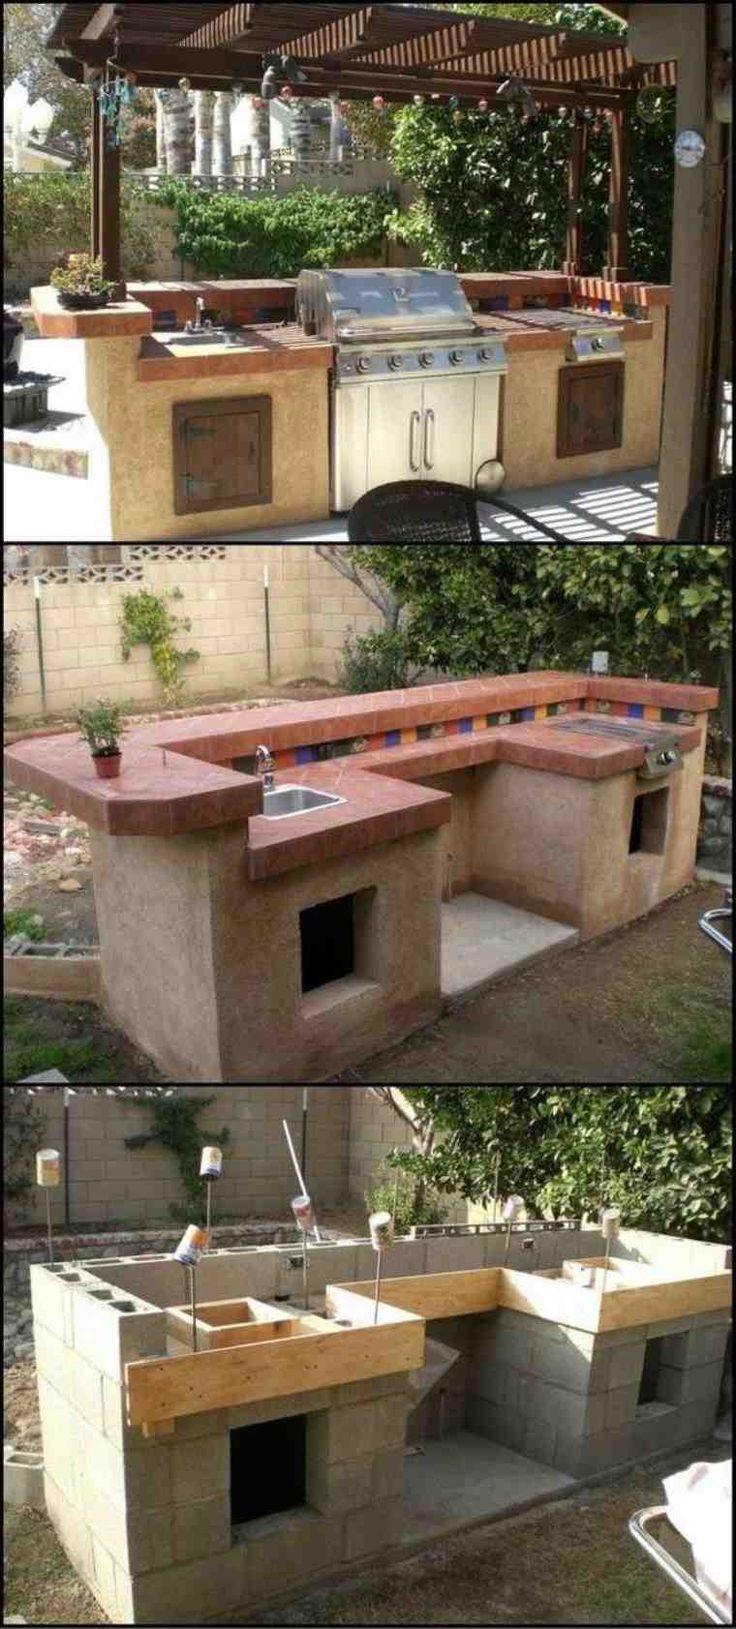 Amenagement-Meuble-Jardin-Remodelage | Bahçe Tasarımı | Dış ... à Allae De Jardin